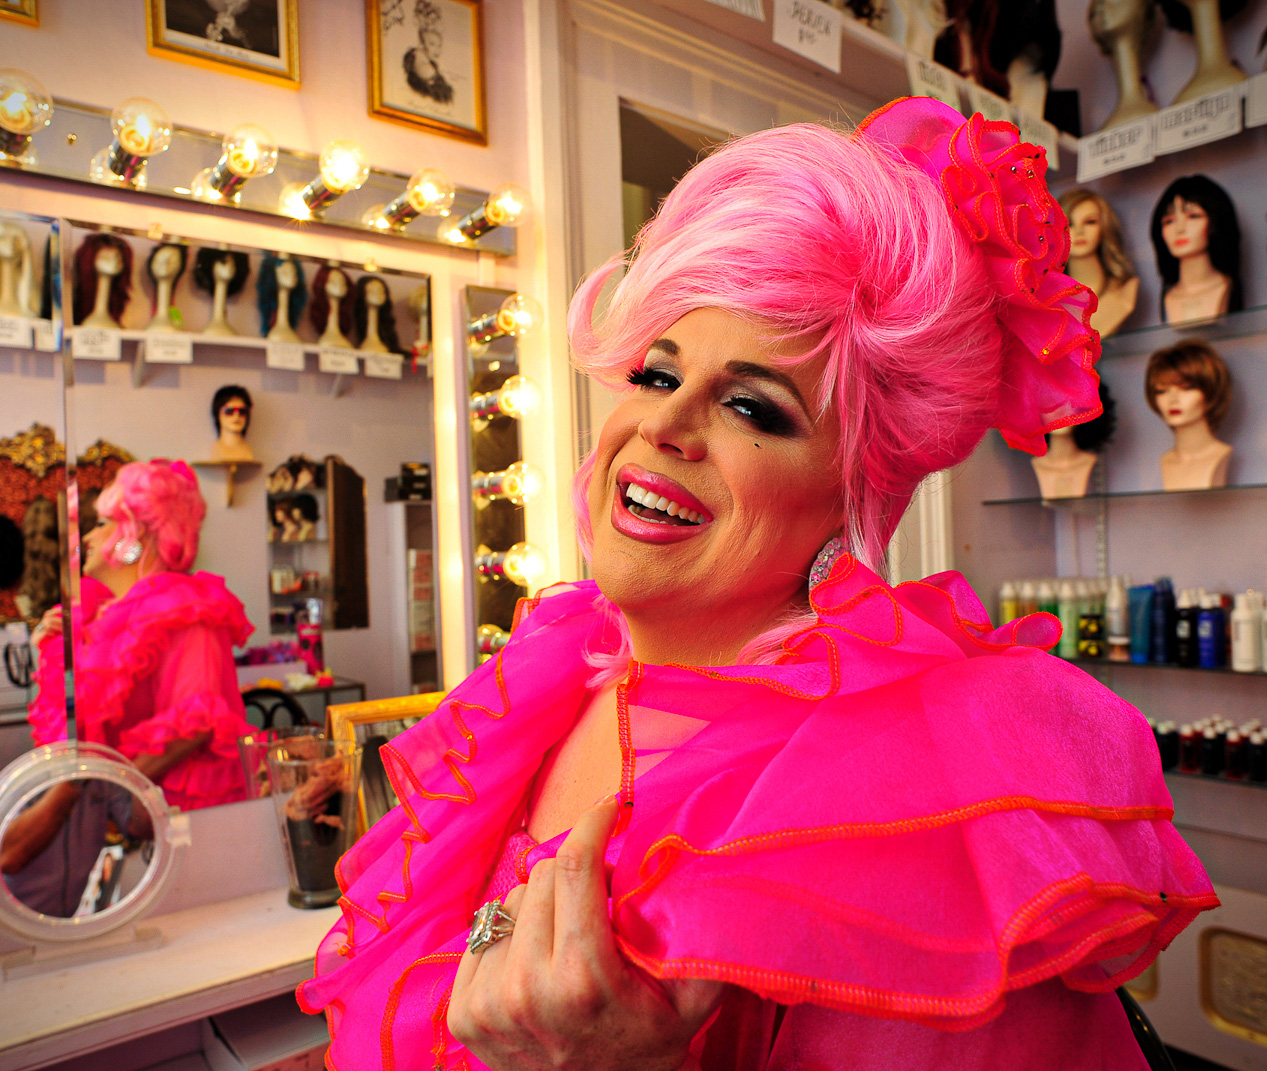 Portrait of Cabaret Performer Rhota Dendron by Will Crockett